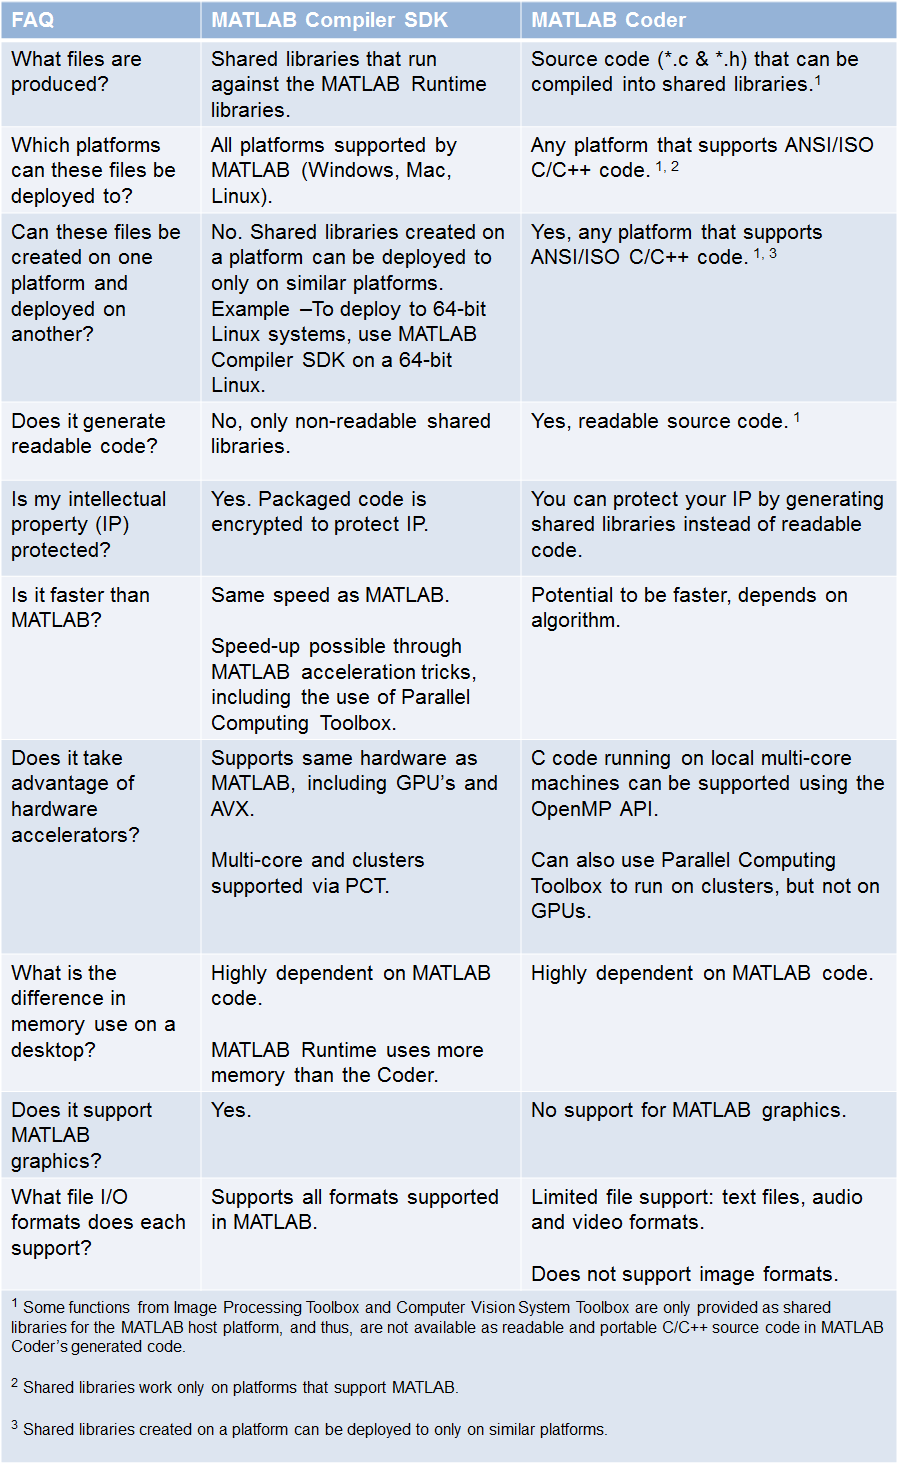 Should I use MATLAB Compiler SDK, or MATLAB Coder to integrate my ...